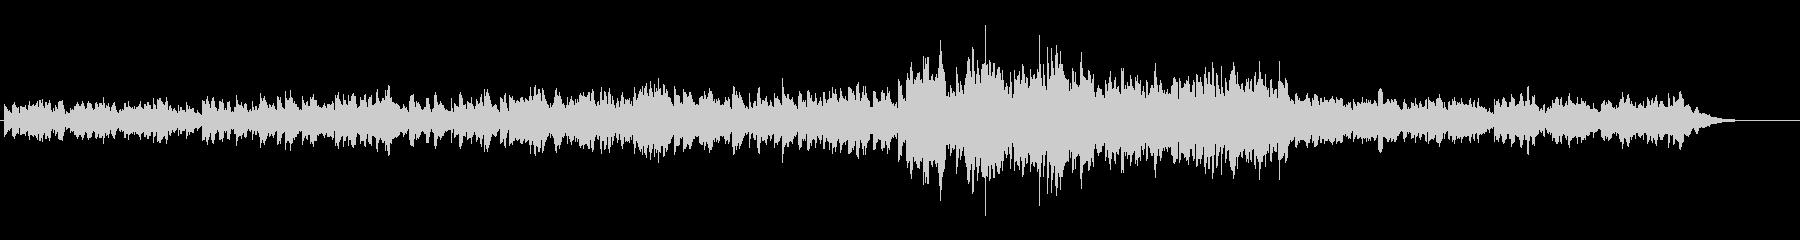 Christmas: Traditional Christmas Music's unreproduced waveform